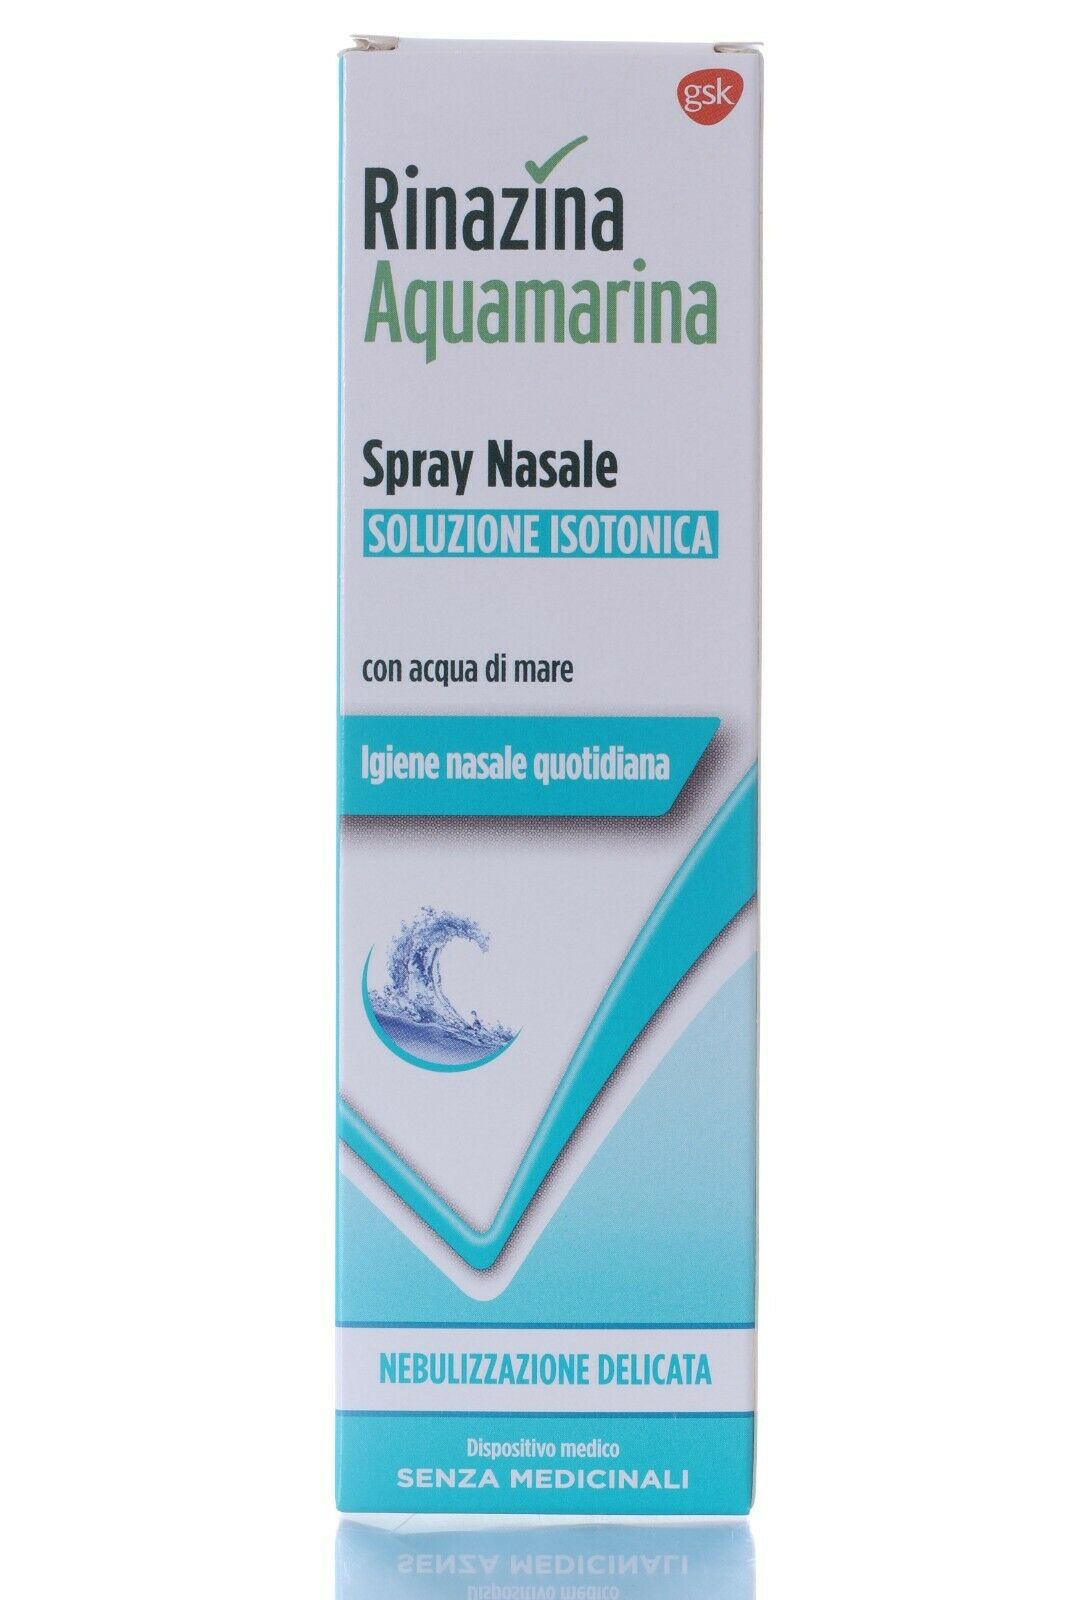 Rinazina Aquamarina Spray Nasale Soluzione Isotonica 100ml